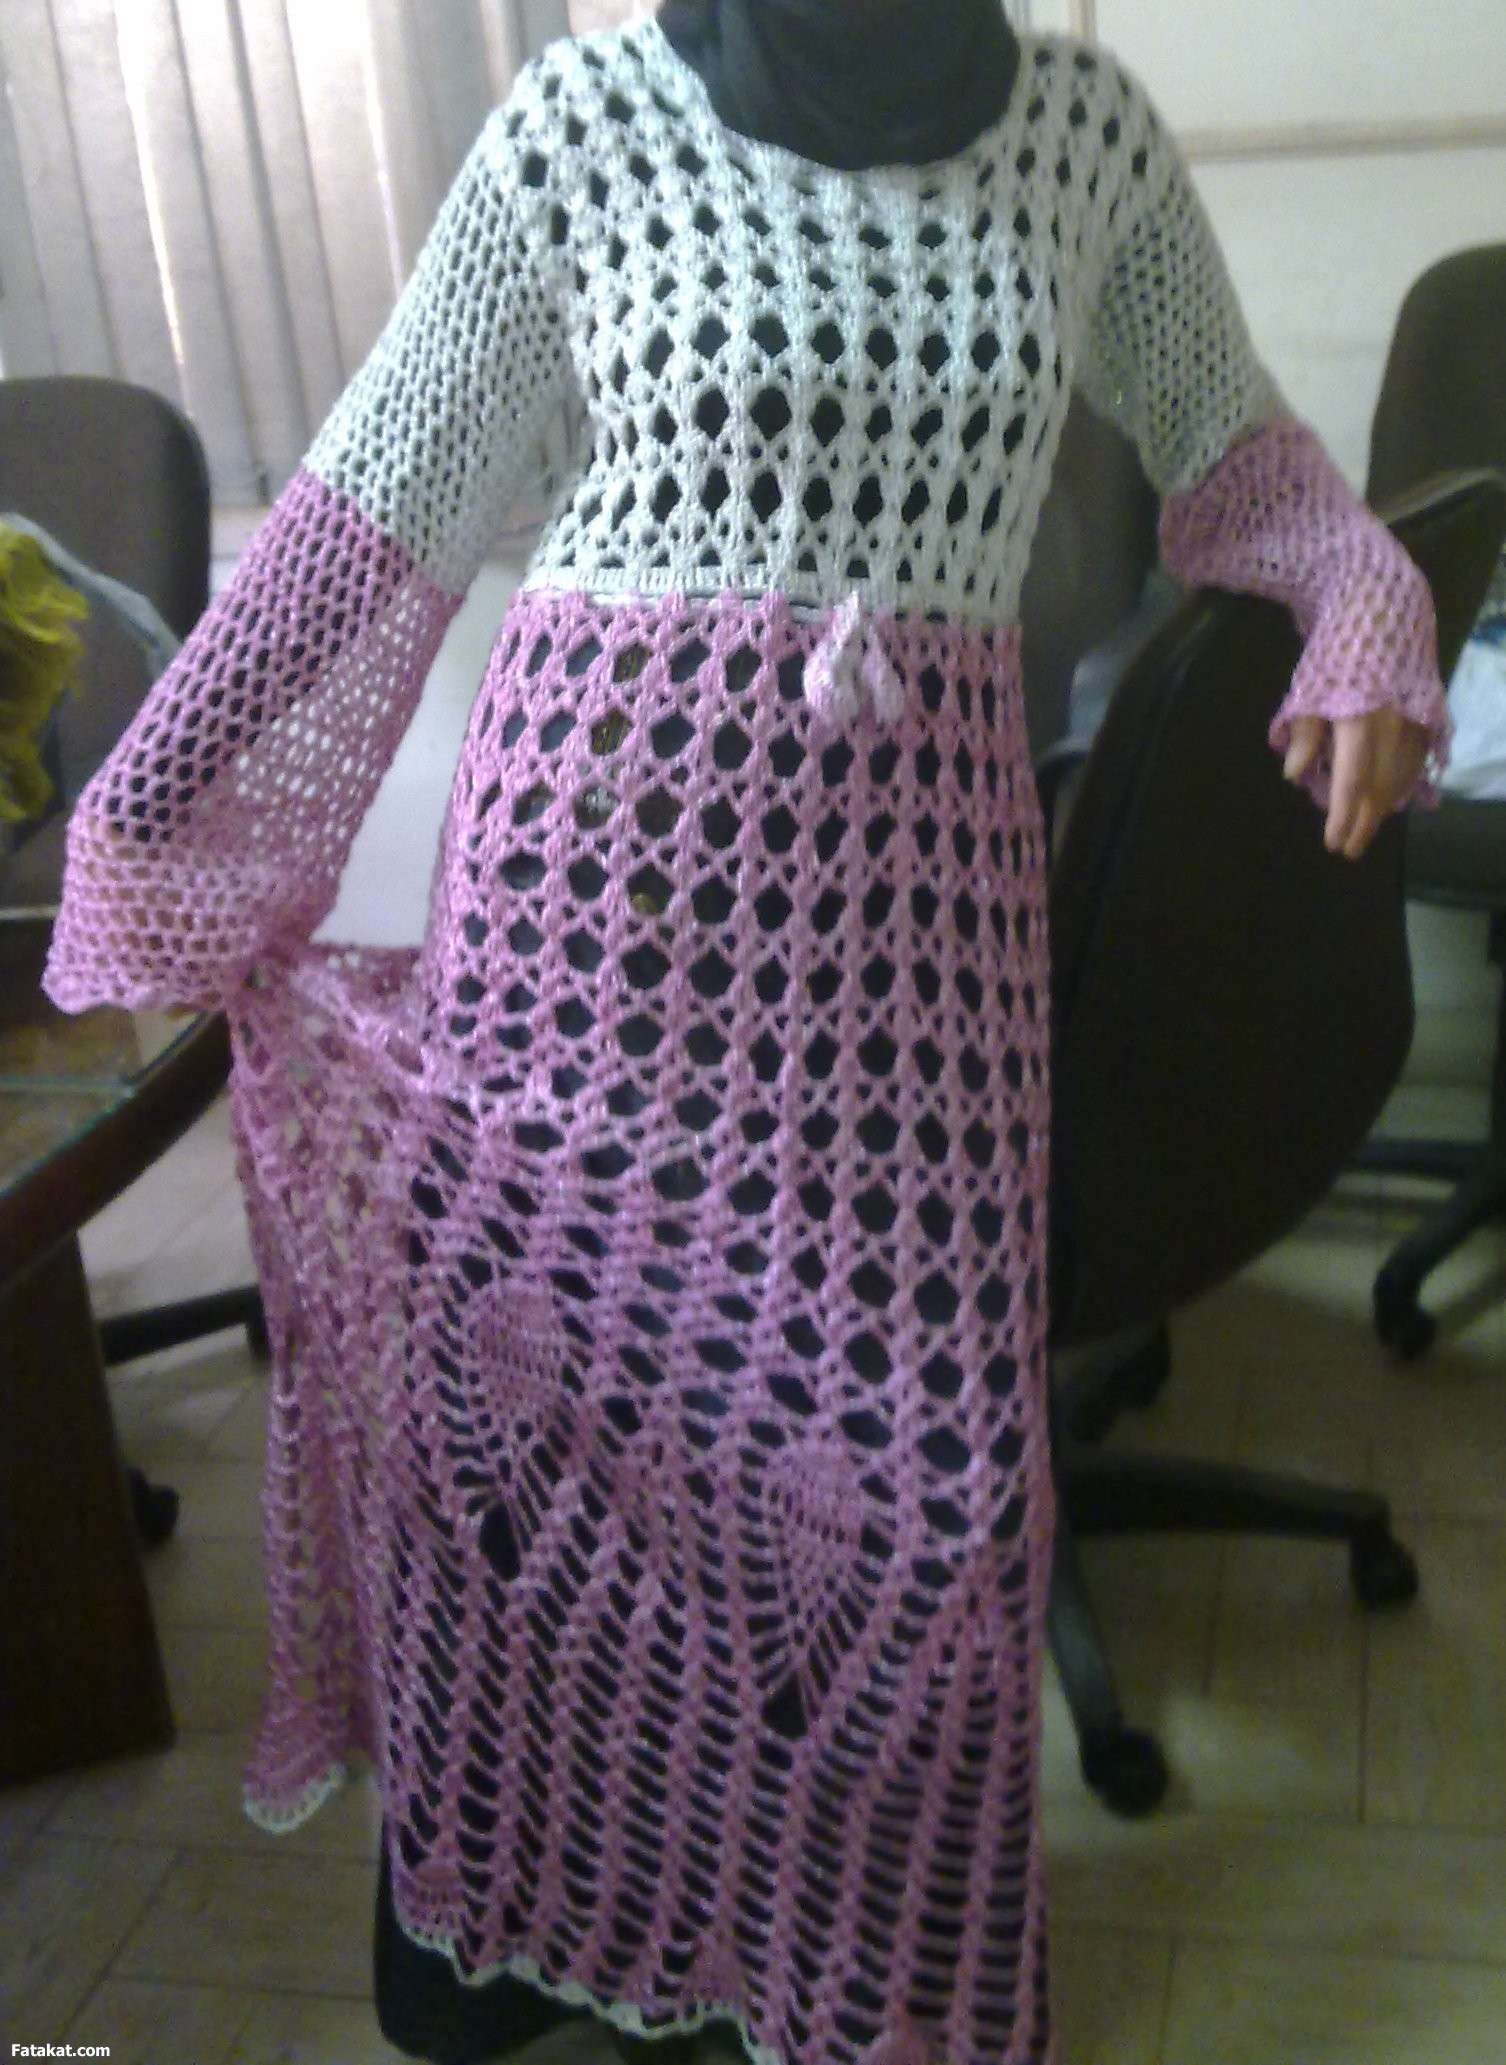 بالصور موديلات فساتين جزائرية كروشي , اجمل ستايلات لفساتين كروشيه جزائرية 3125 8